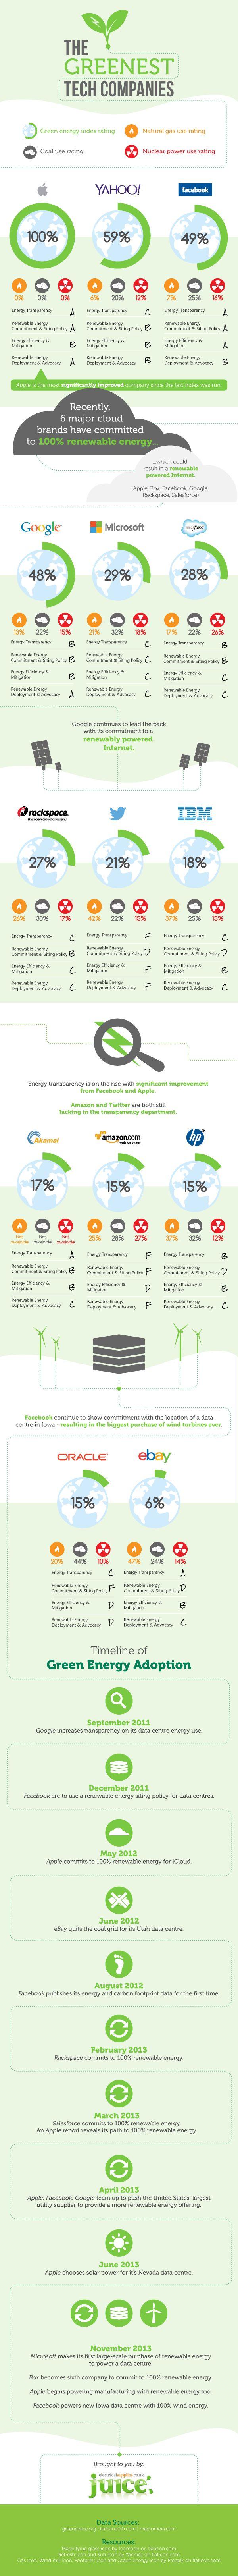 The Greenest Tech Companies